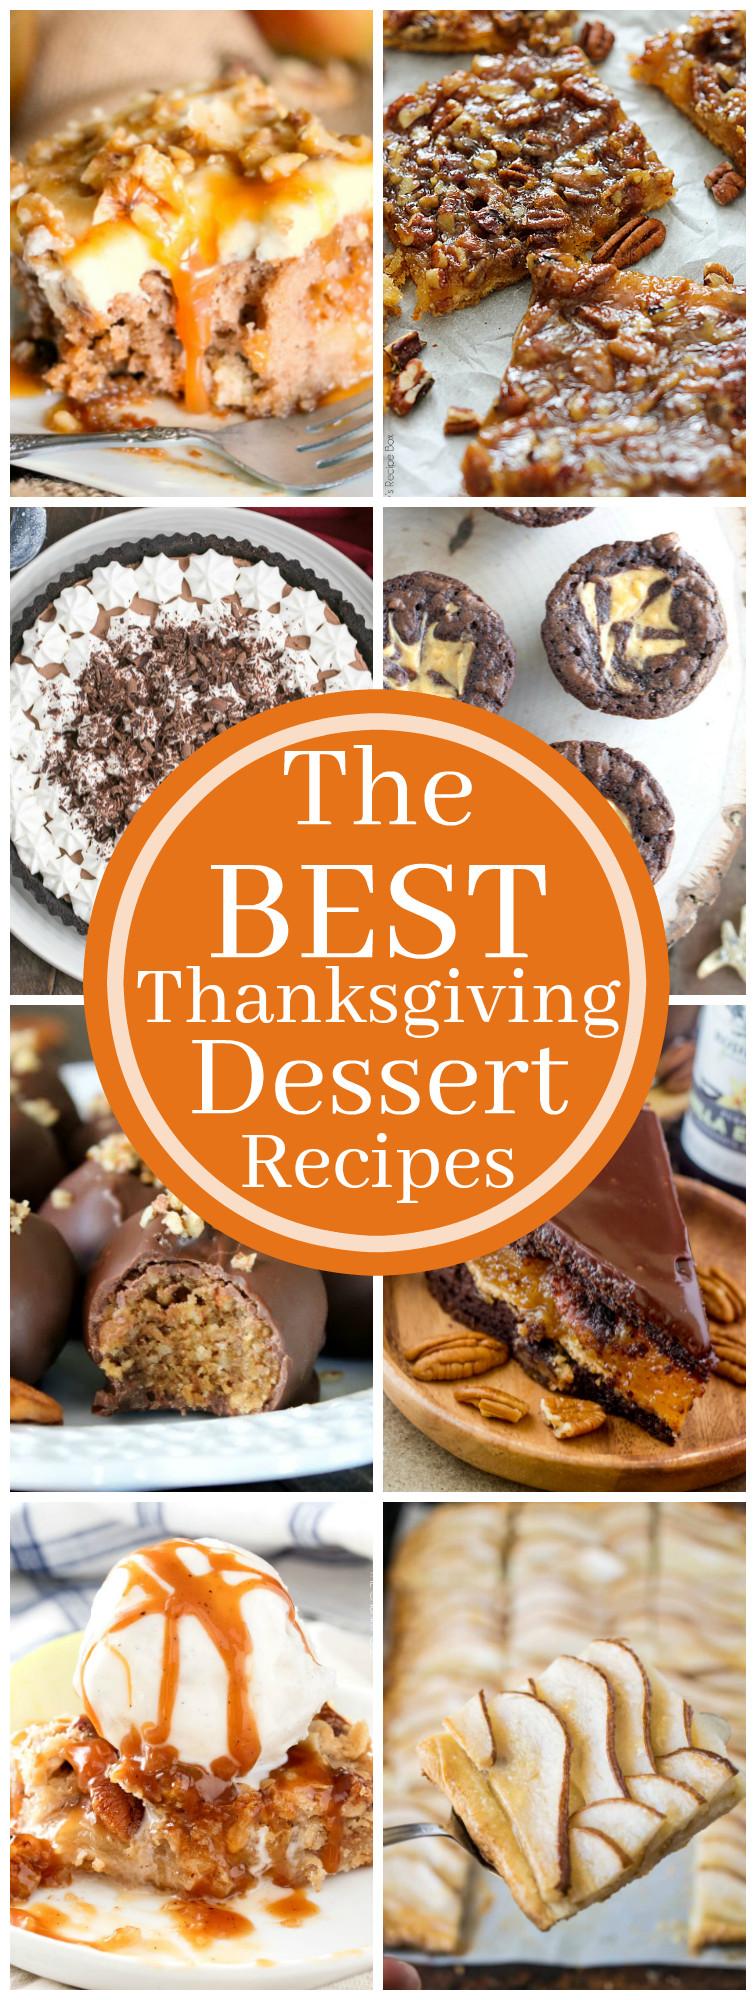 Thanksgiving Dessert Recipes  The Best Thanksgiving Desserts Savory Experiments